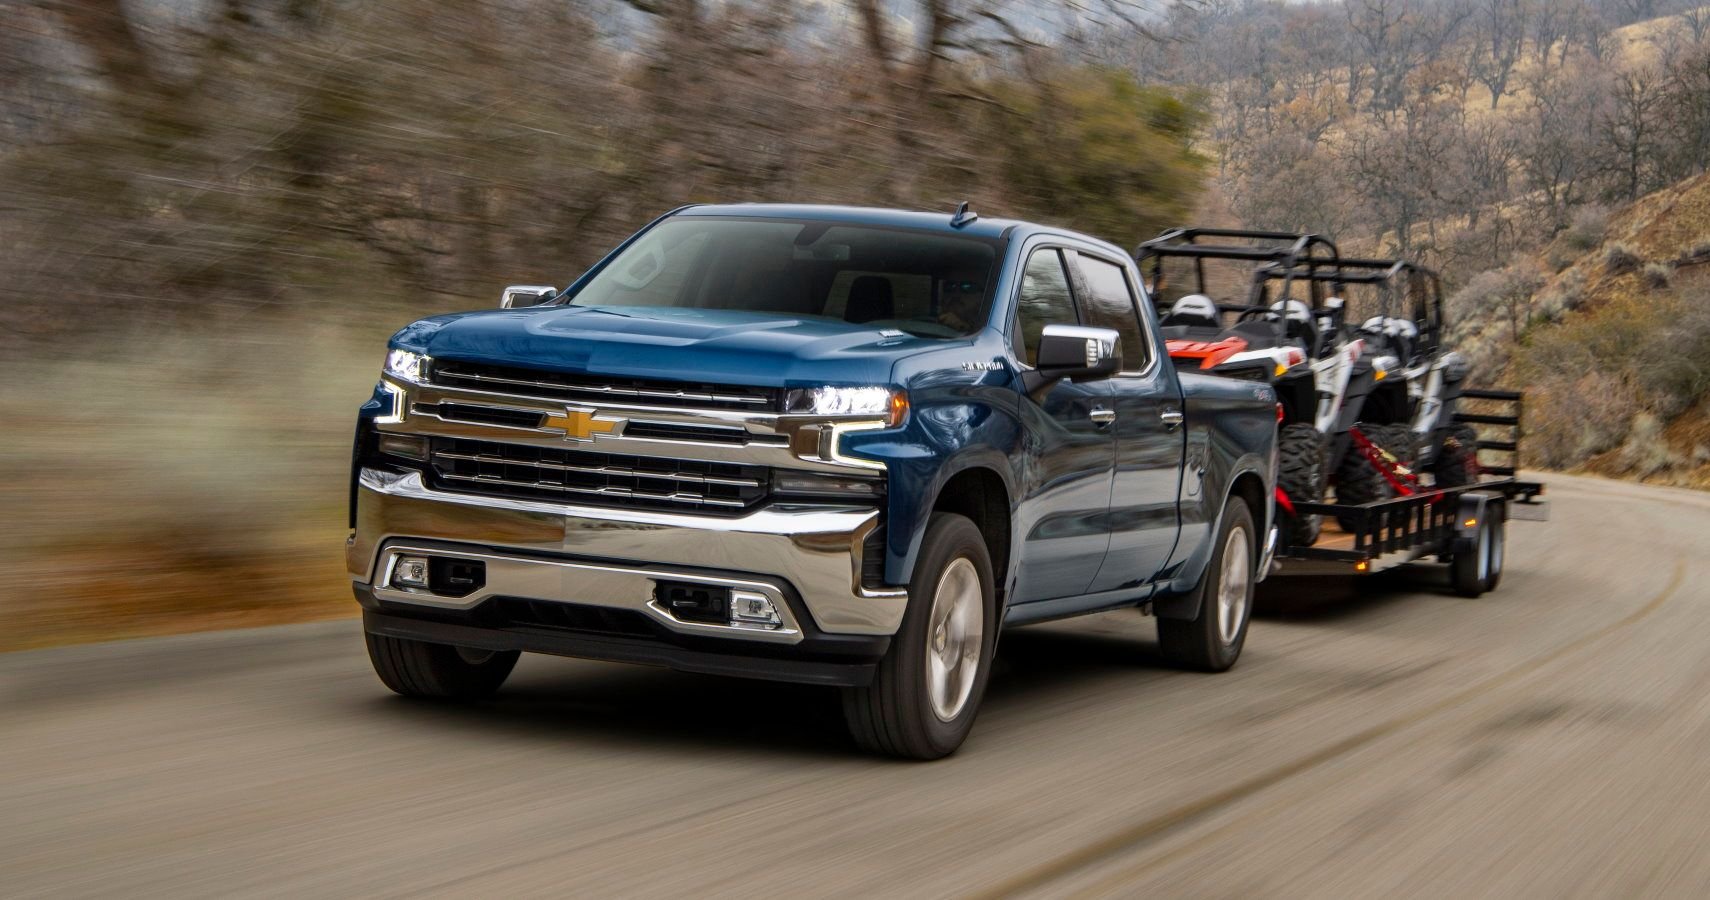 2020 Chevy Silverado 1500 Diesel Provides 33 MPG Highway